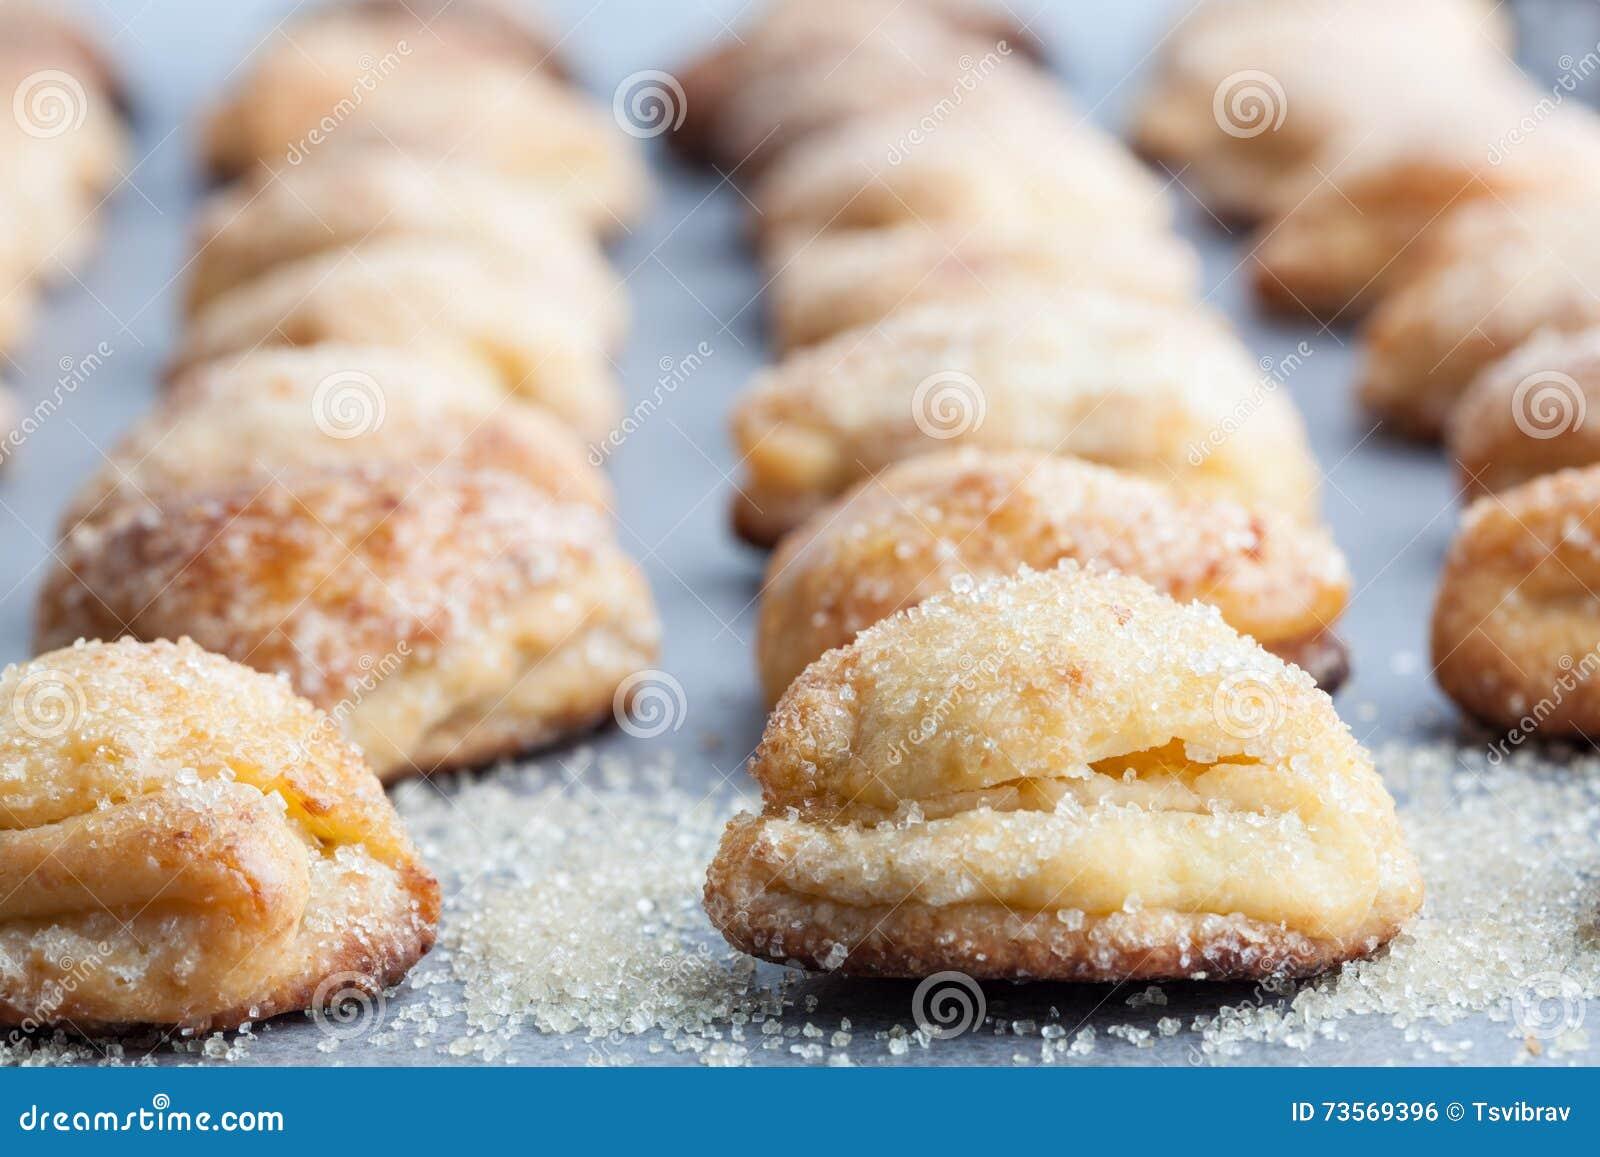 Печенье из творога с сахаром